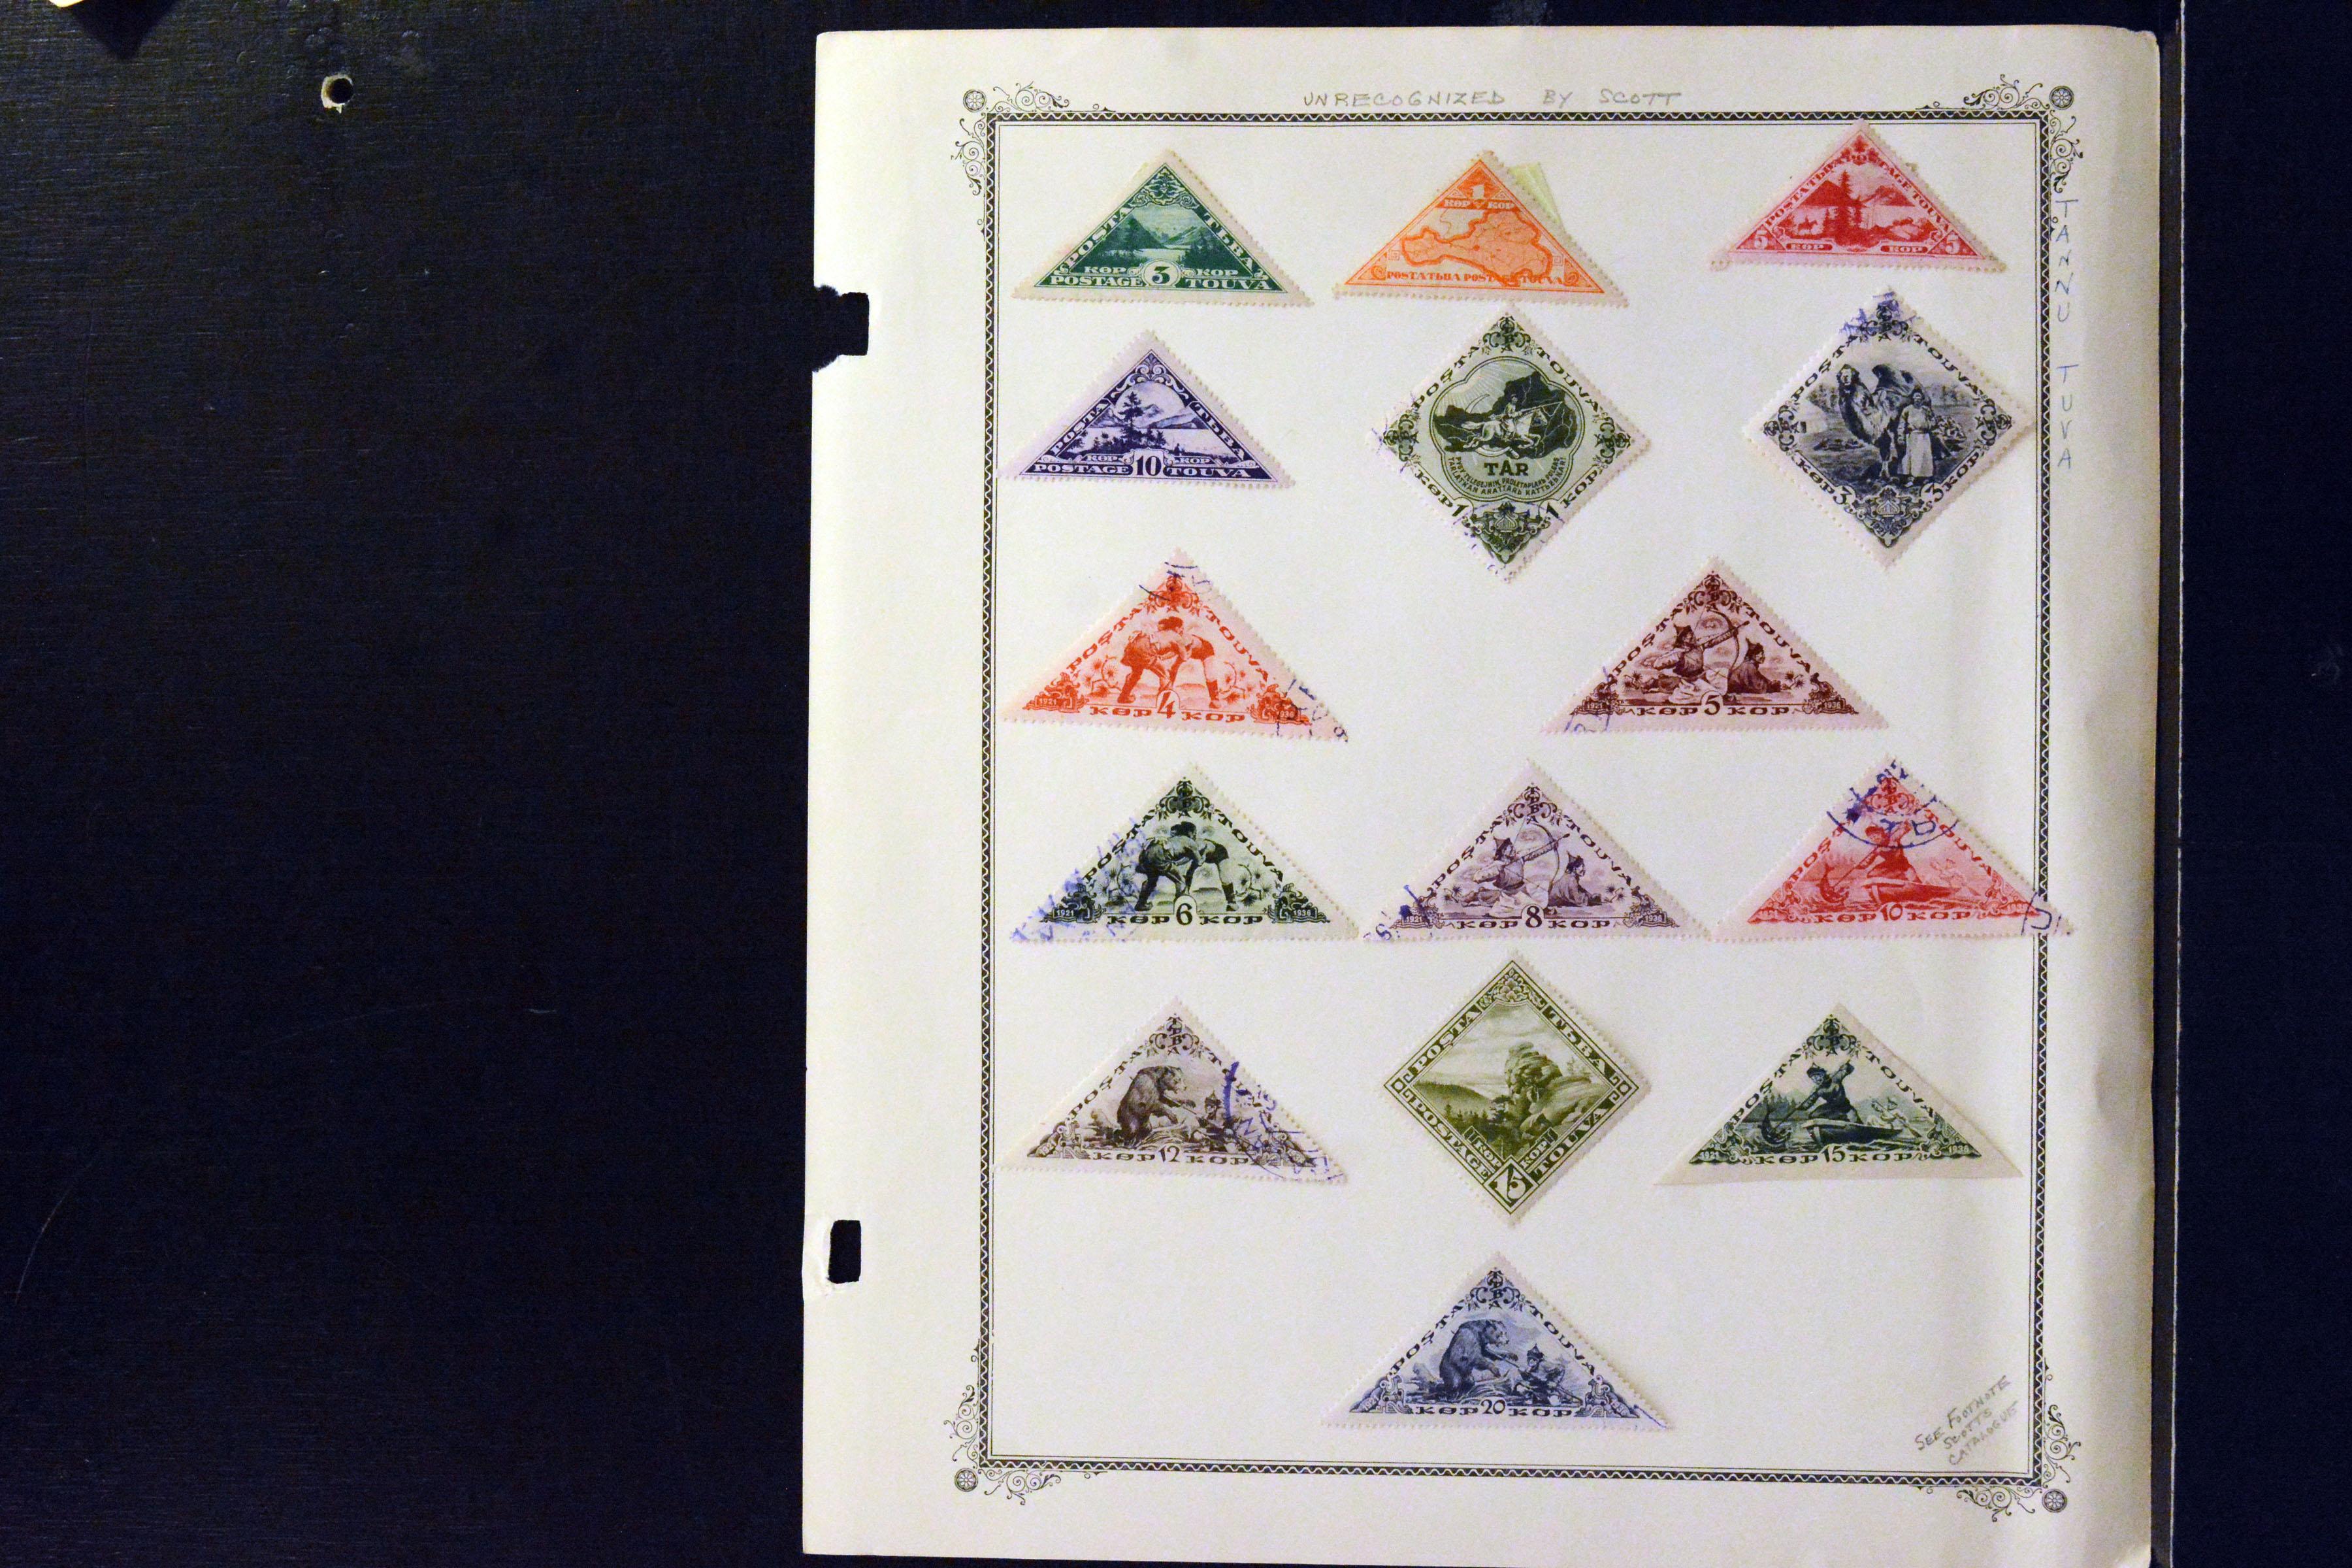 Nederland collectie plaatfouten p en pm mast catalogus catawiki